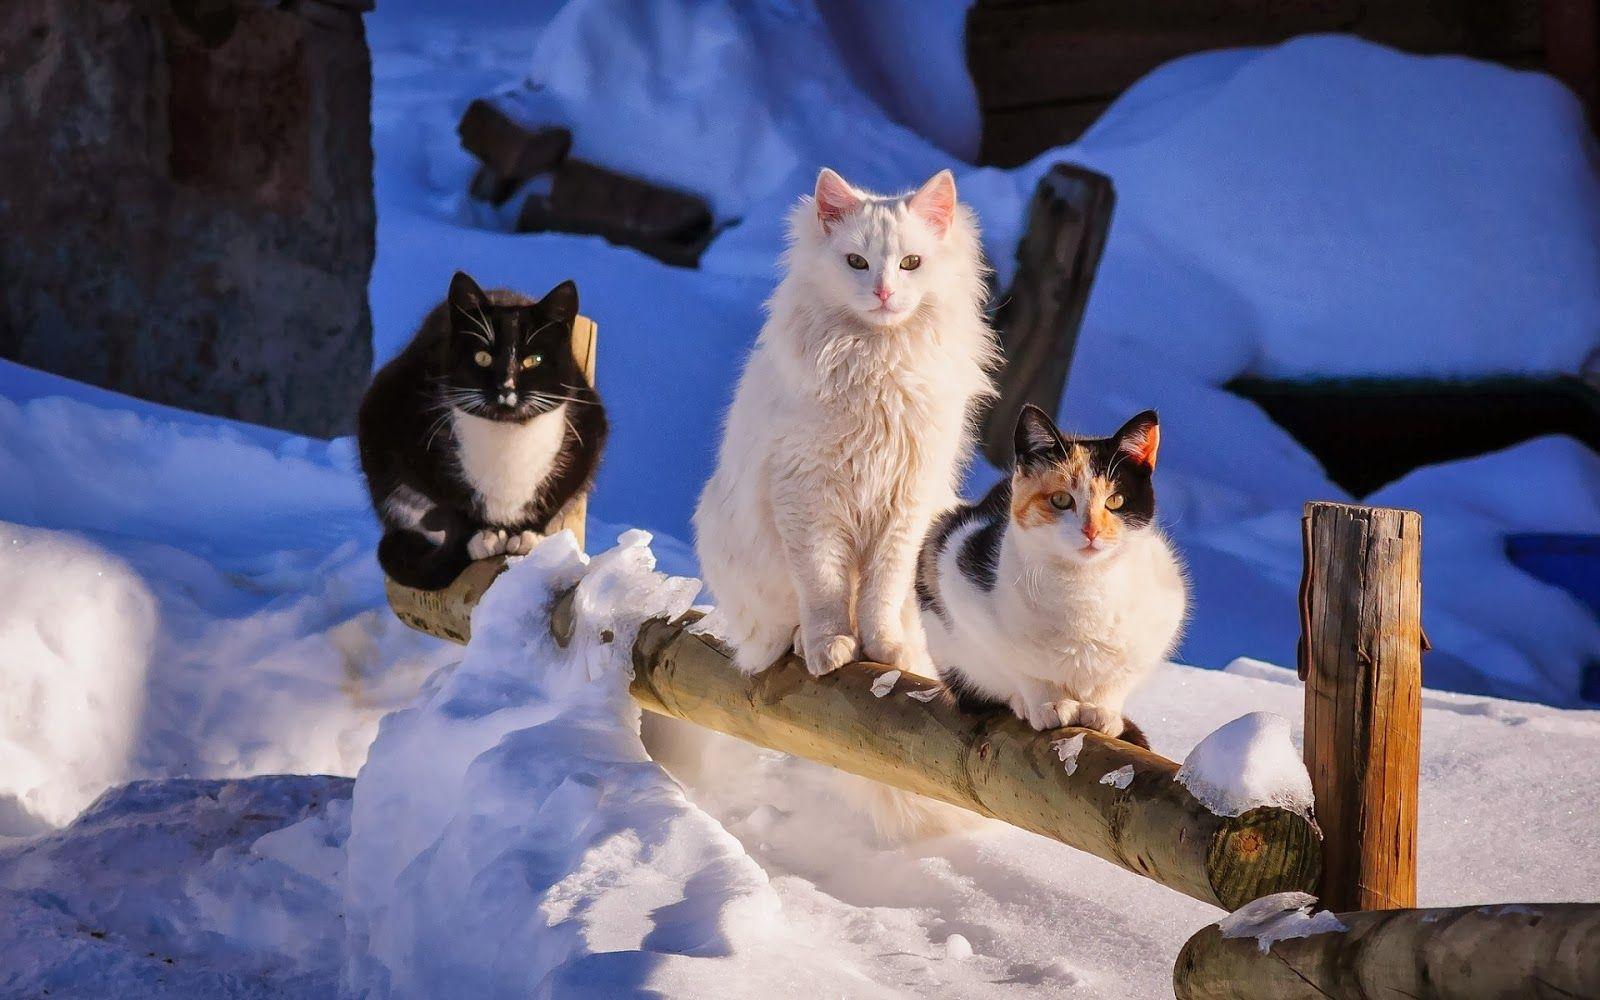 Schone Katzenbilder Schonen Winter Hintergrund Mit Katzen Im Schnee Hd Winter Cute Cat Wallpaper Winter Cat Cats